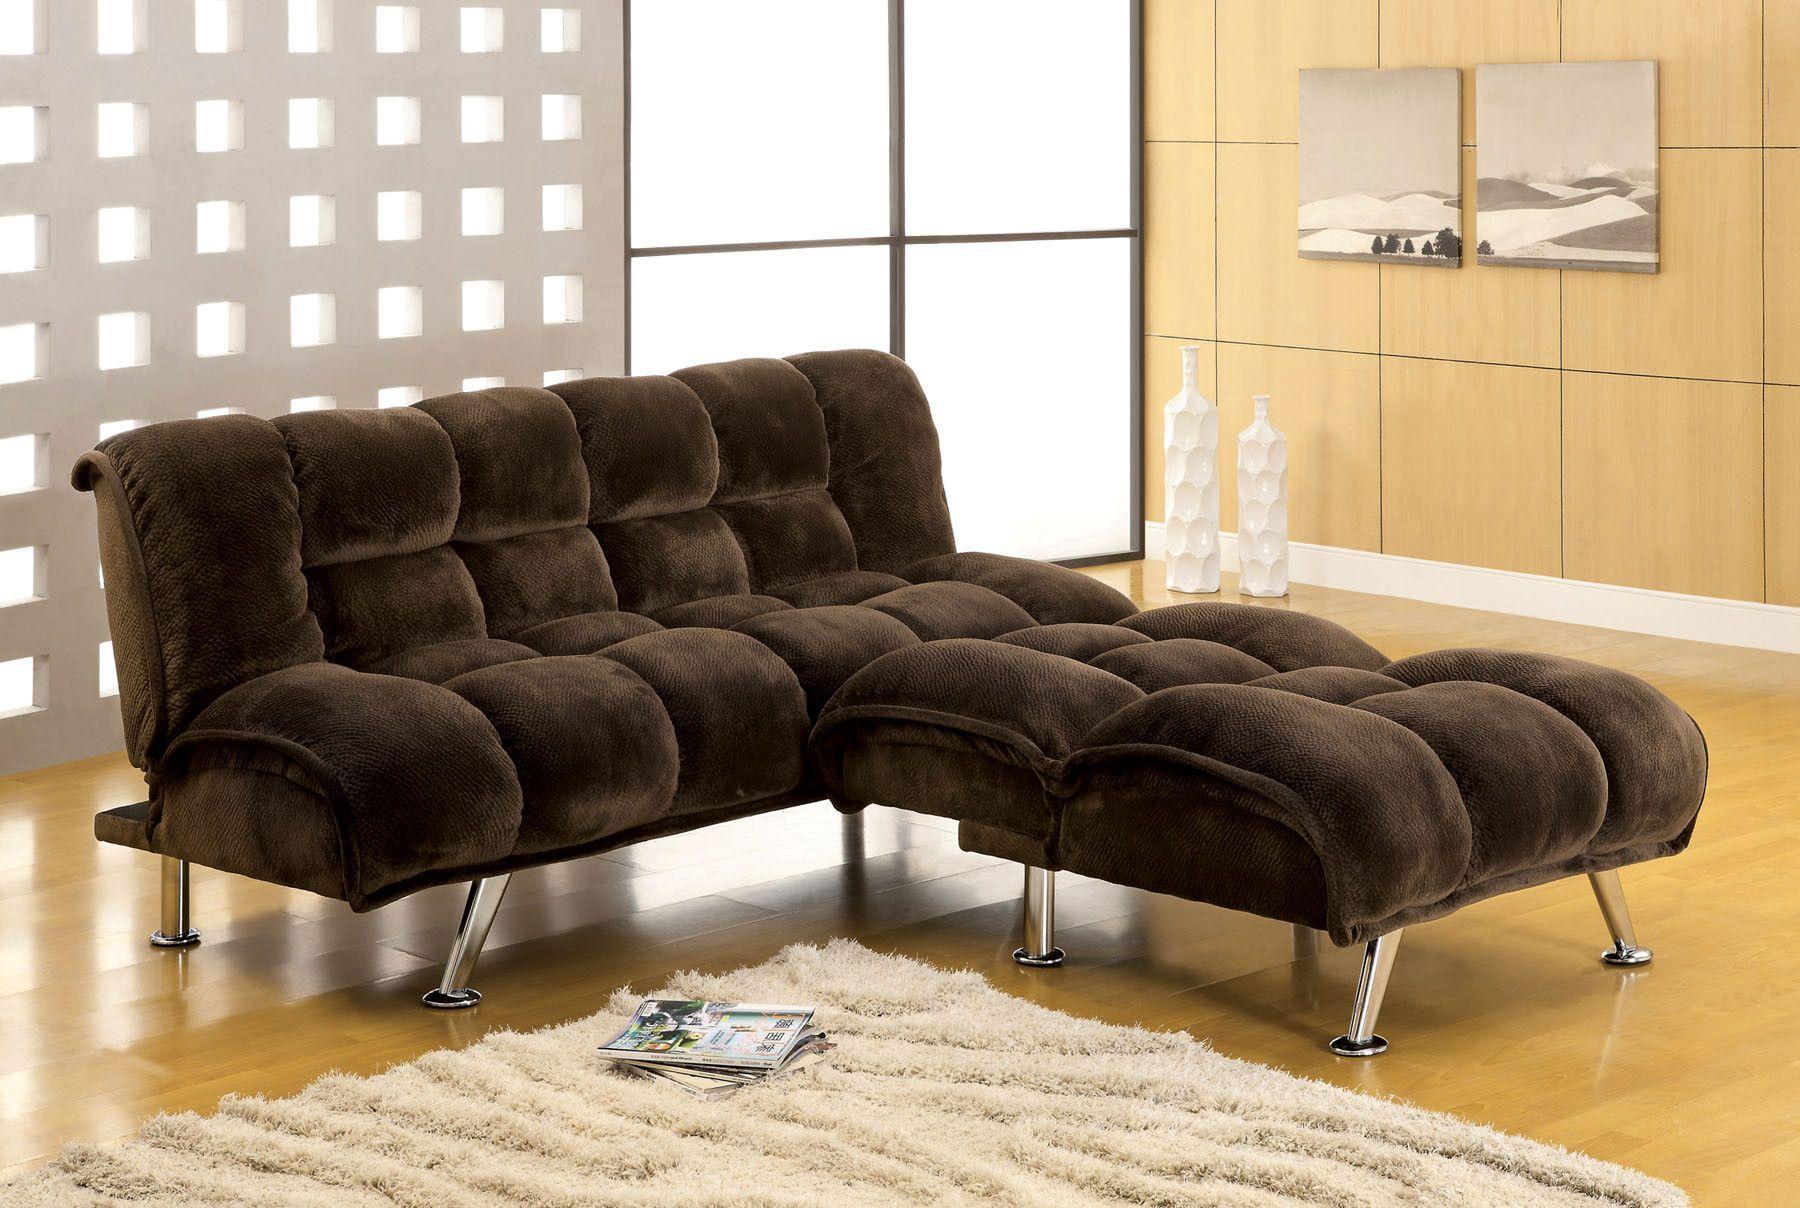 Furniture Of America Marbelle Futon Sofa